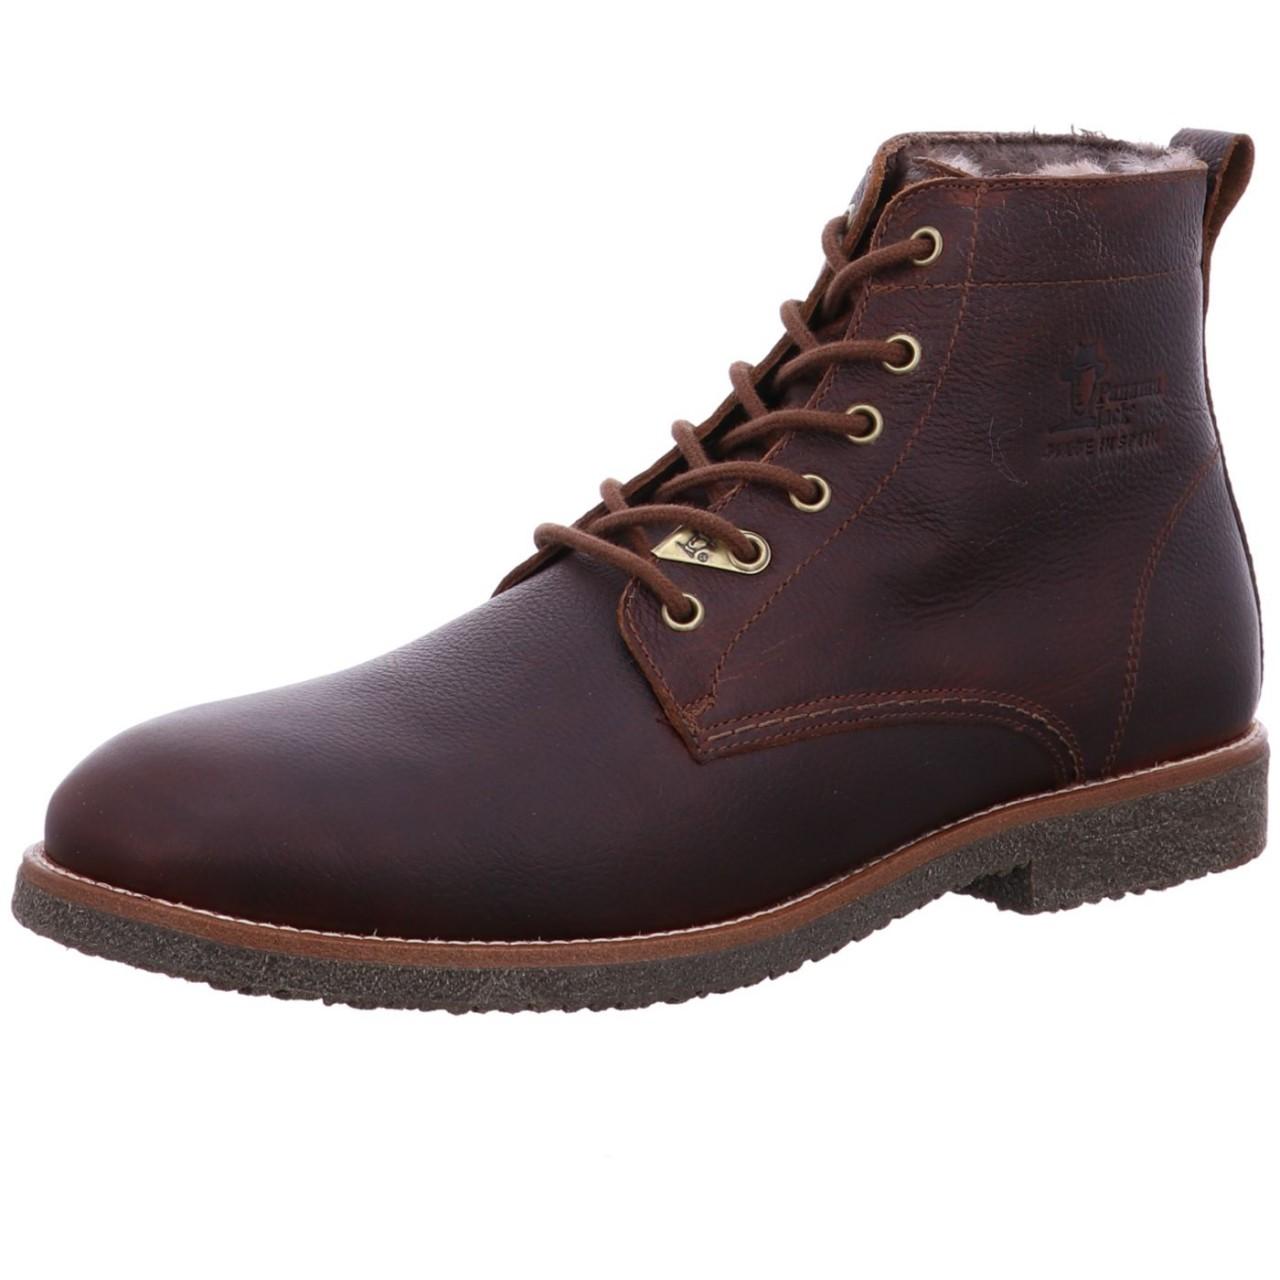 Panama Jack Boot Glasgow Igloo C6 Braun Glasgow Igloo C6 chestnut